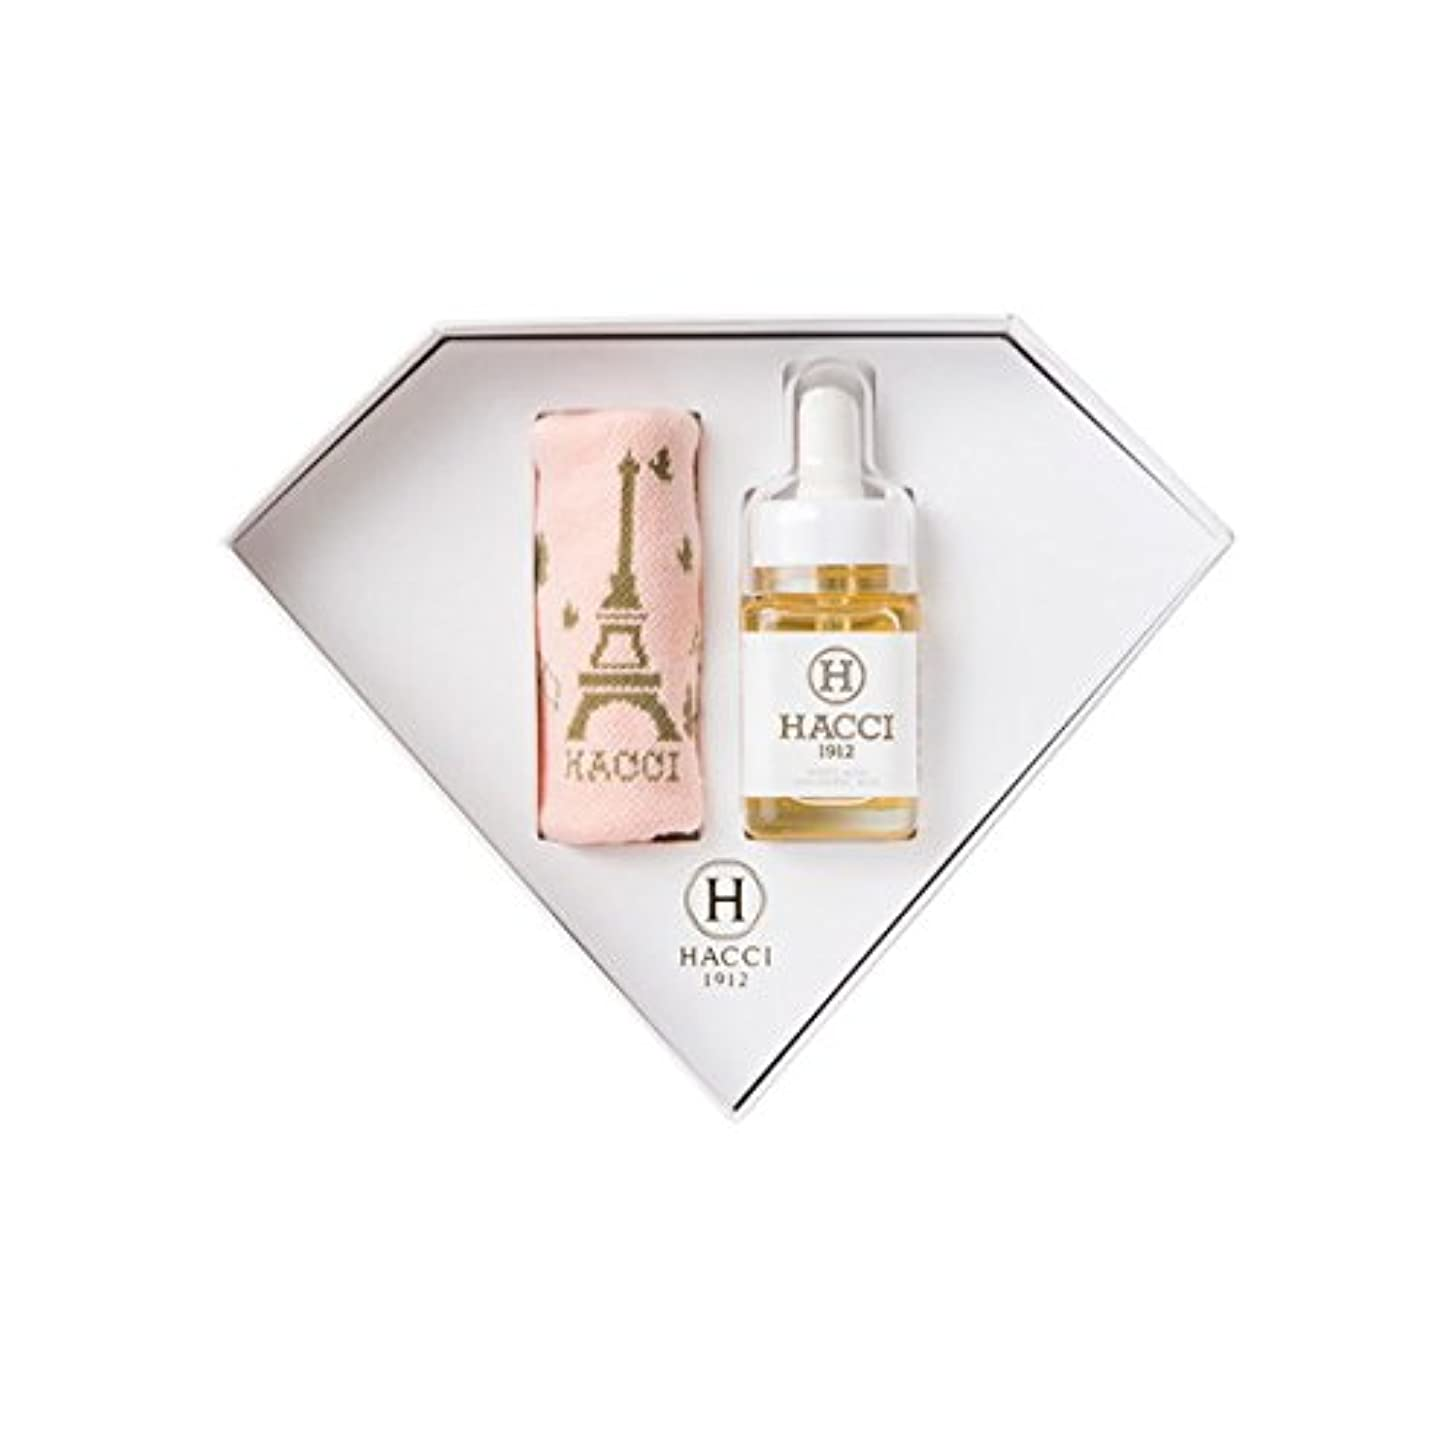 HACCI ミニダイヤモンドBOX(BEAUTY HONEY40g) (ヒアルロン酸入りはちみつ)